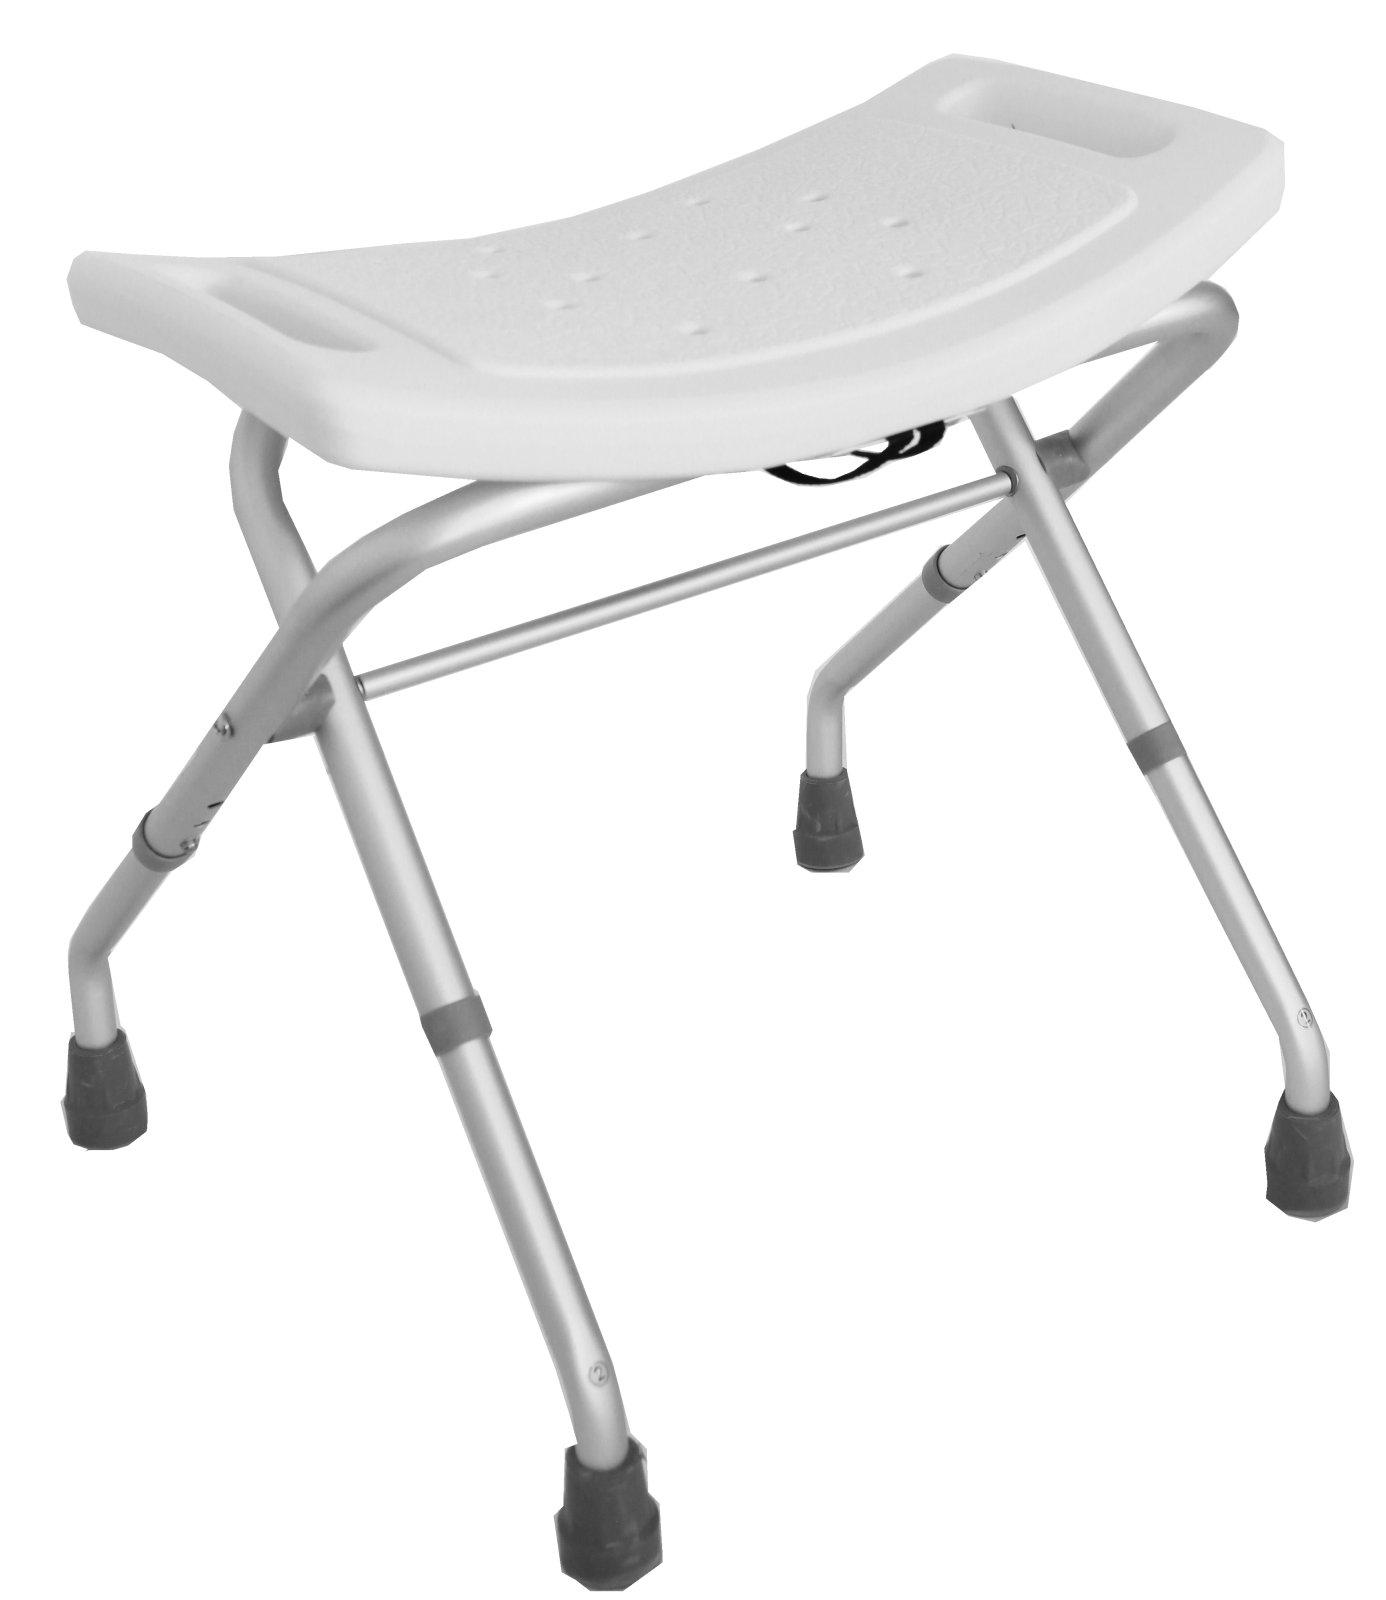 duschstuhl klappbar badhocker badestuhl duschhocker 150 kg klappstuhl ebay. Black Bedroom Furniture Sets. Home Design Ideas